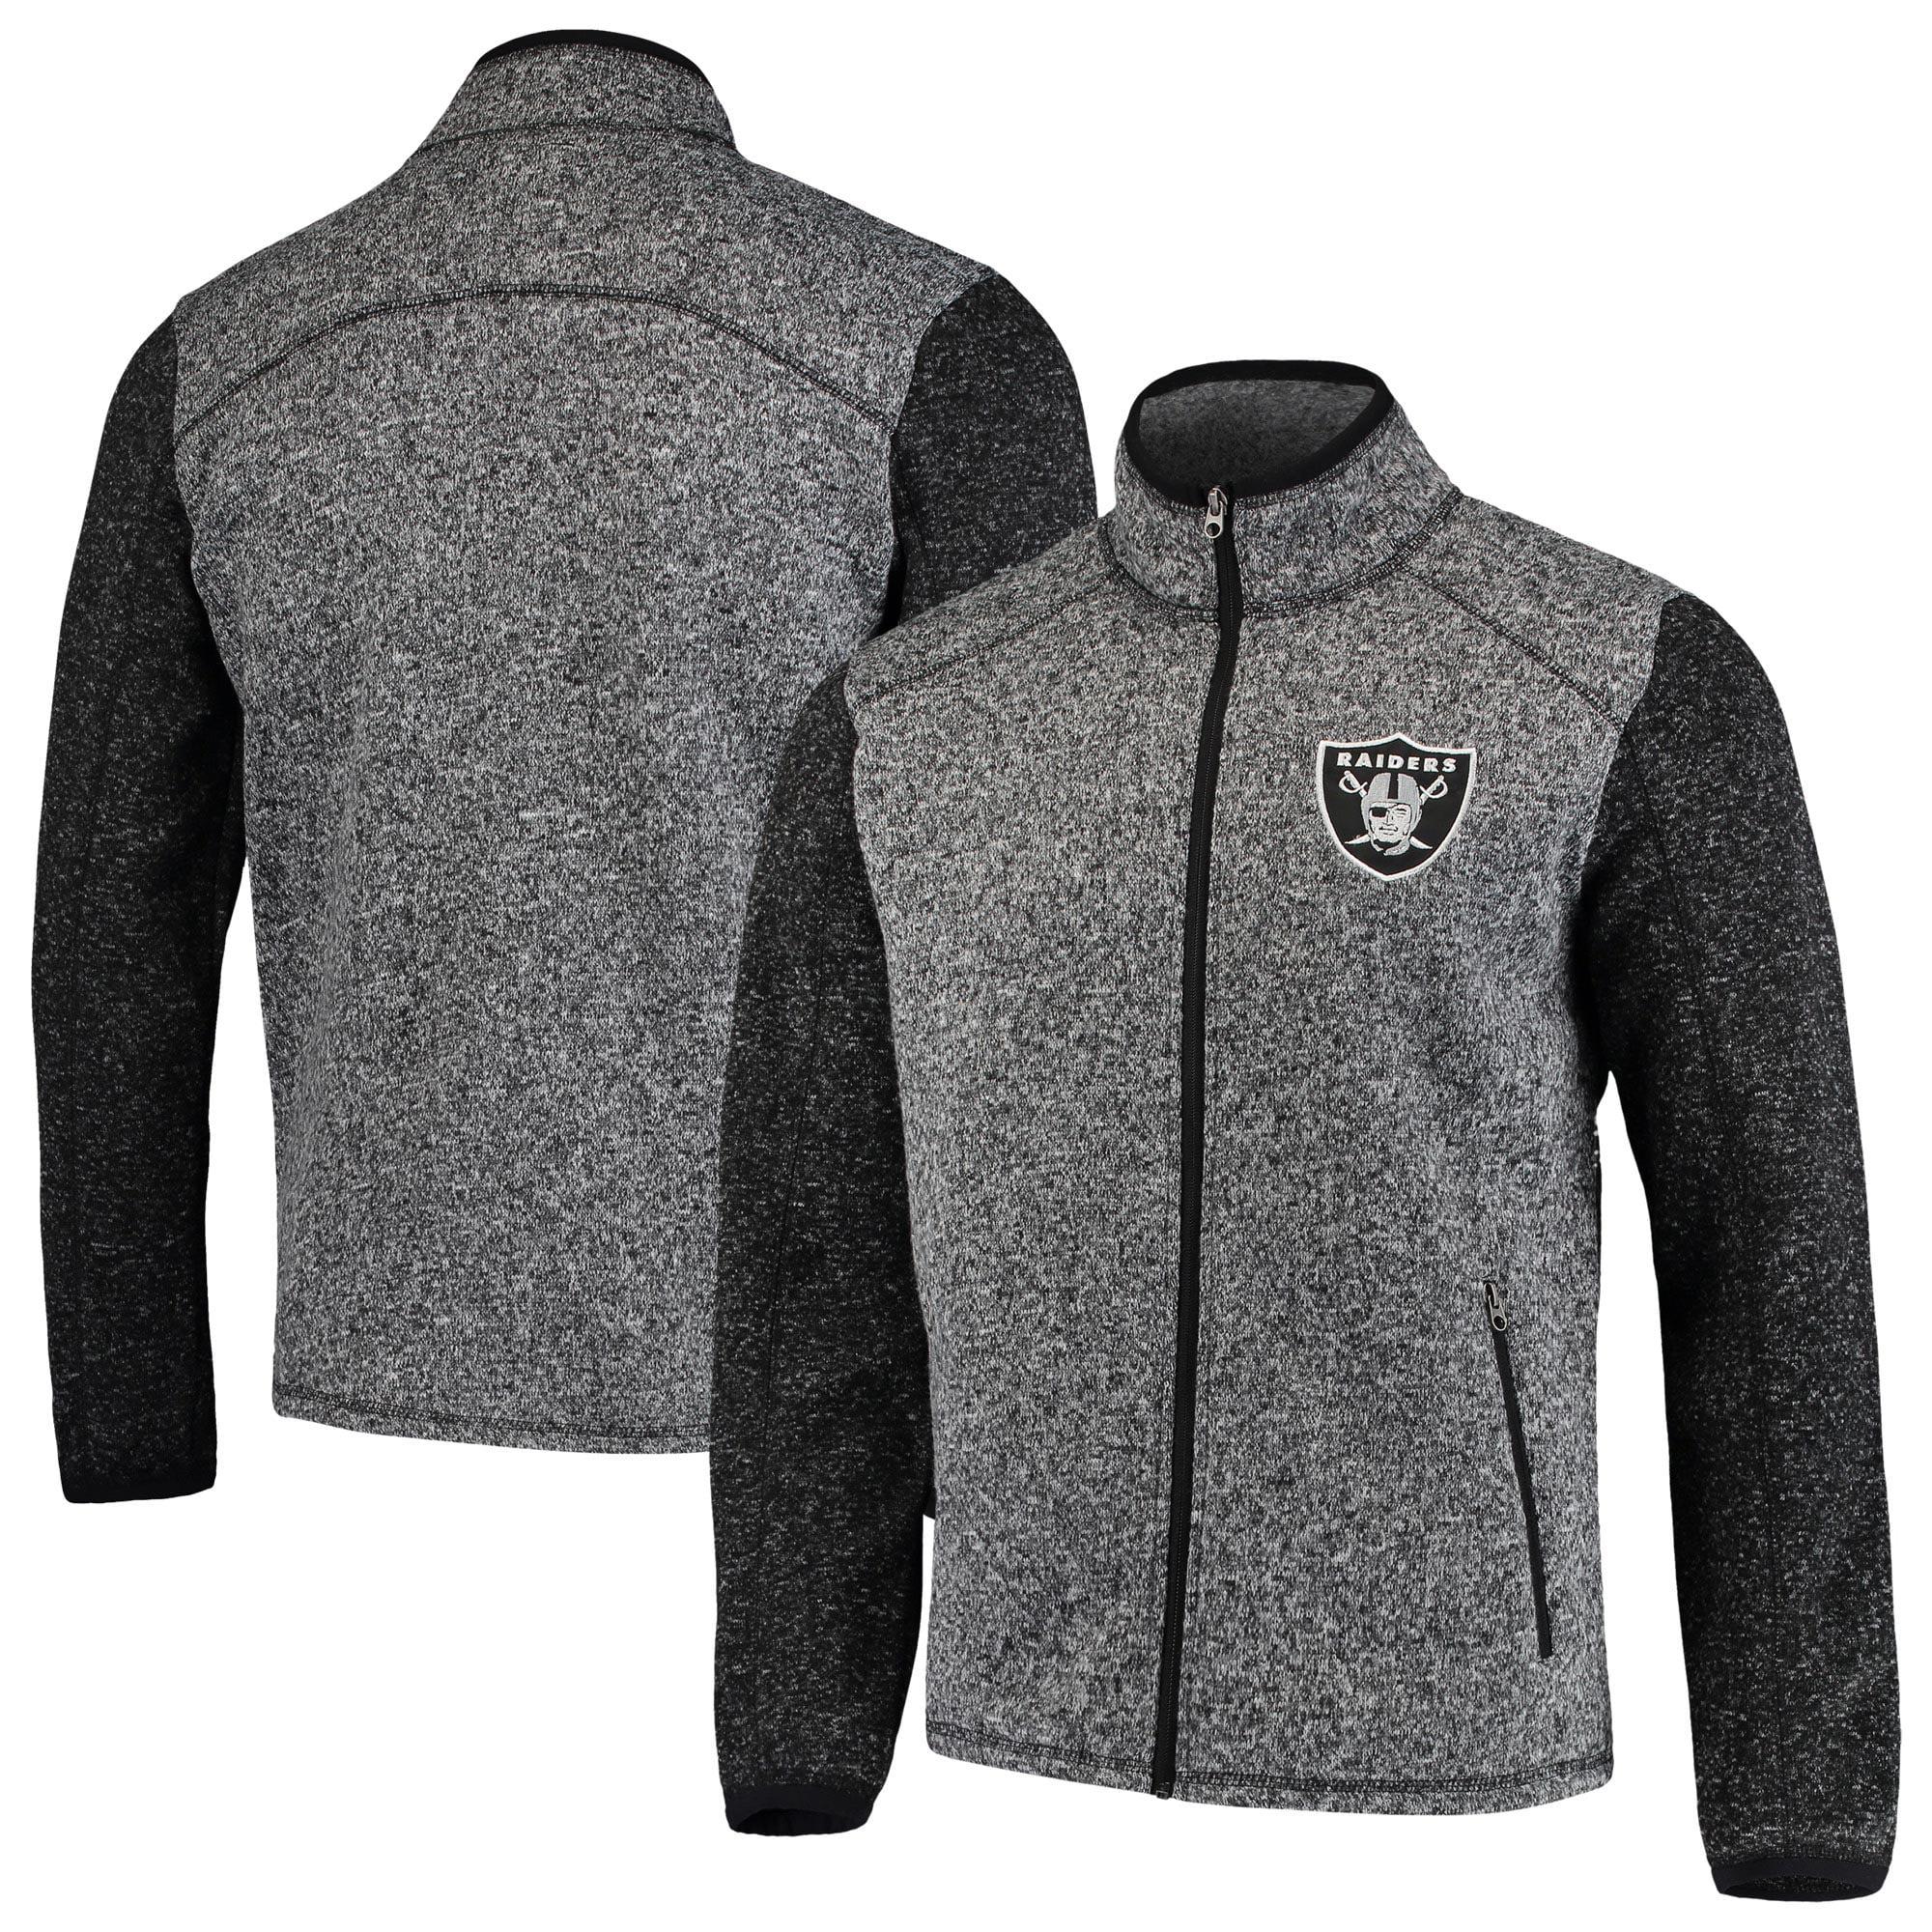 Oakland Raiders G-III Sports by Carl Banks Alpine Zone Sweater Fleece Full-Zip Jacket - Heathered Charcoal